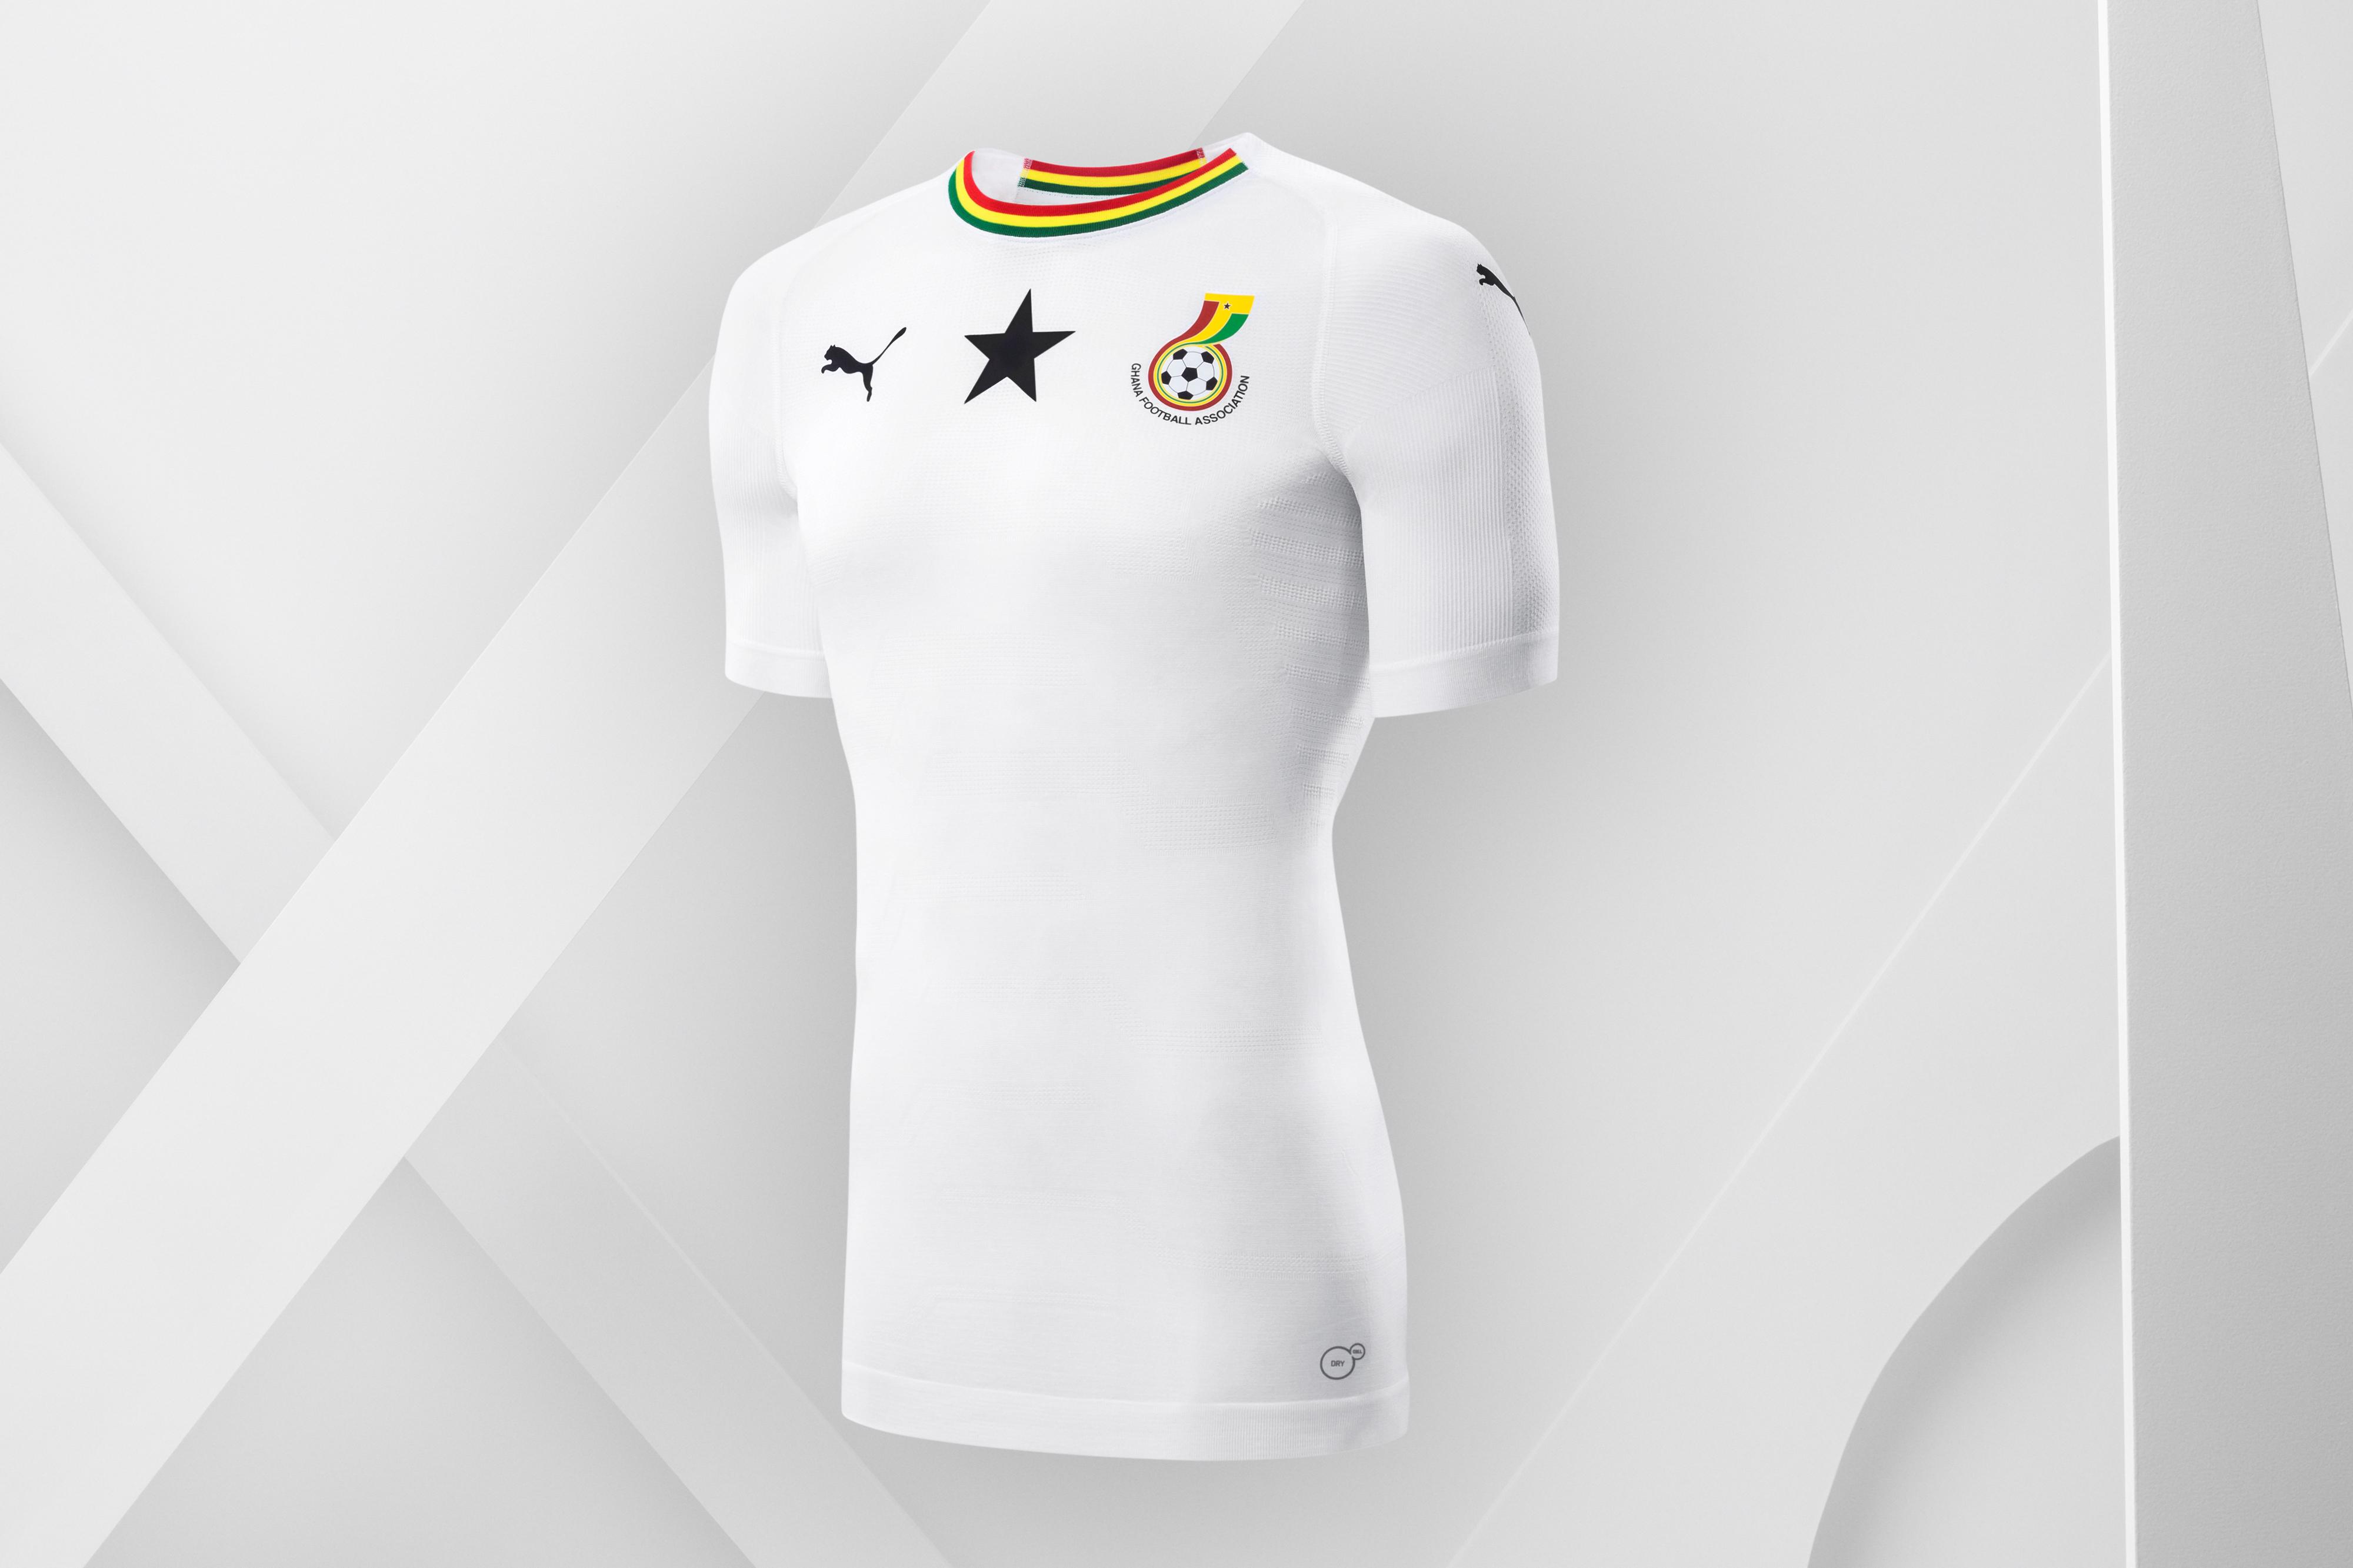 c355484a7e Atacante vaza nova camisa da Juventus na web